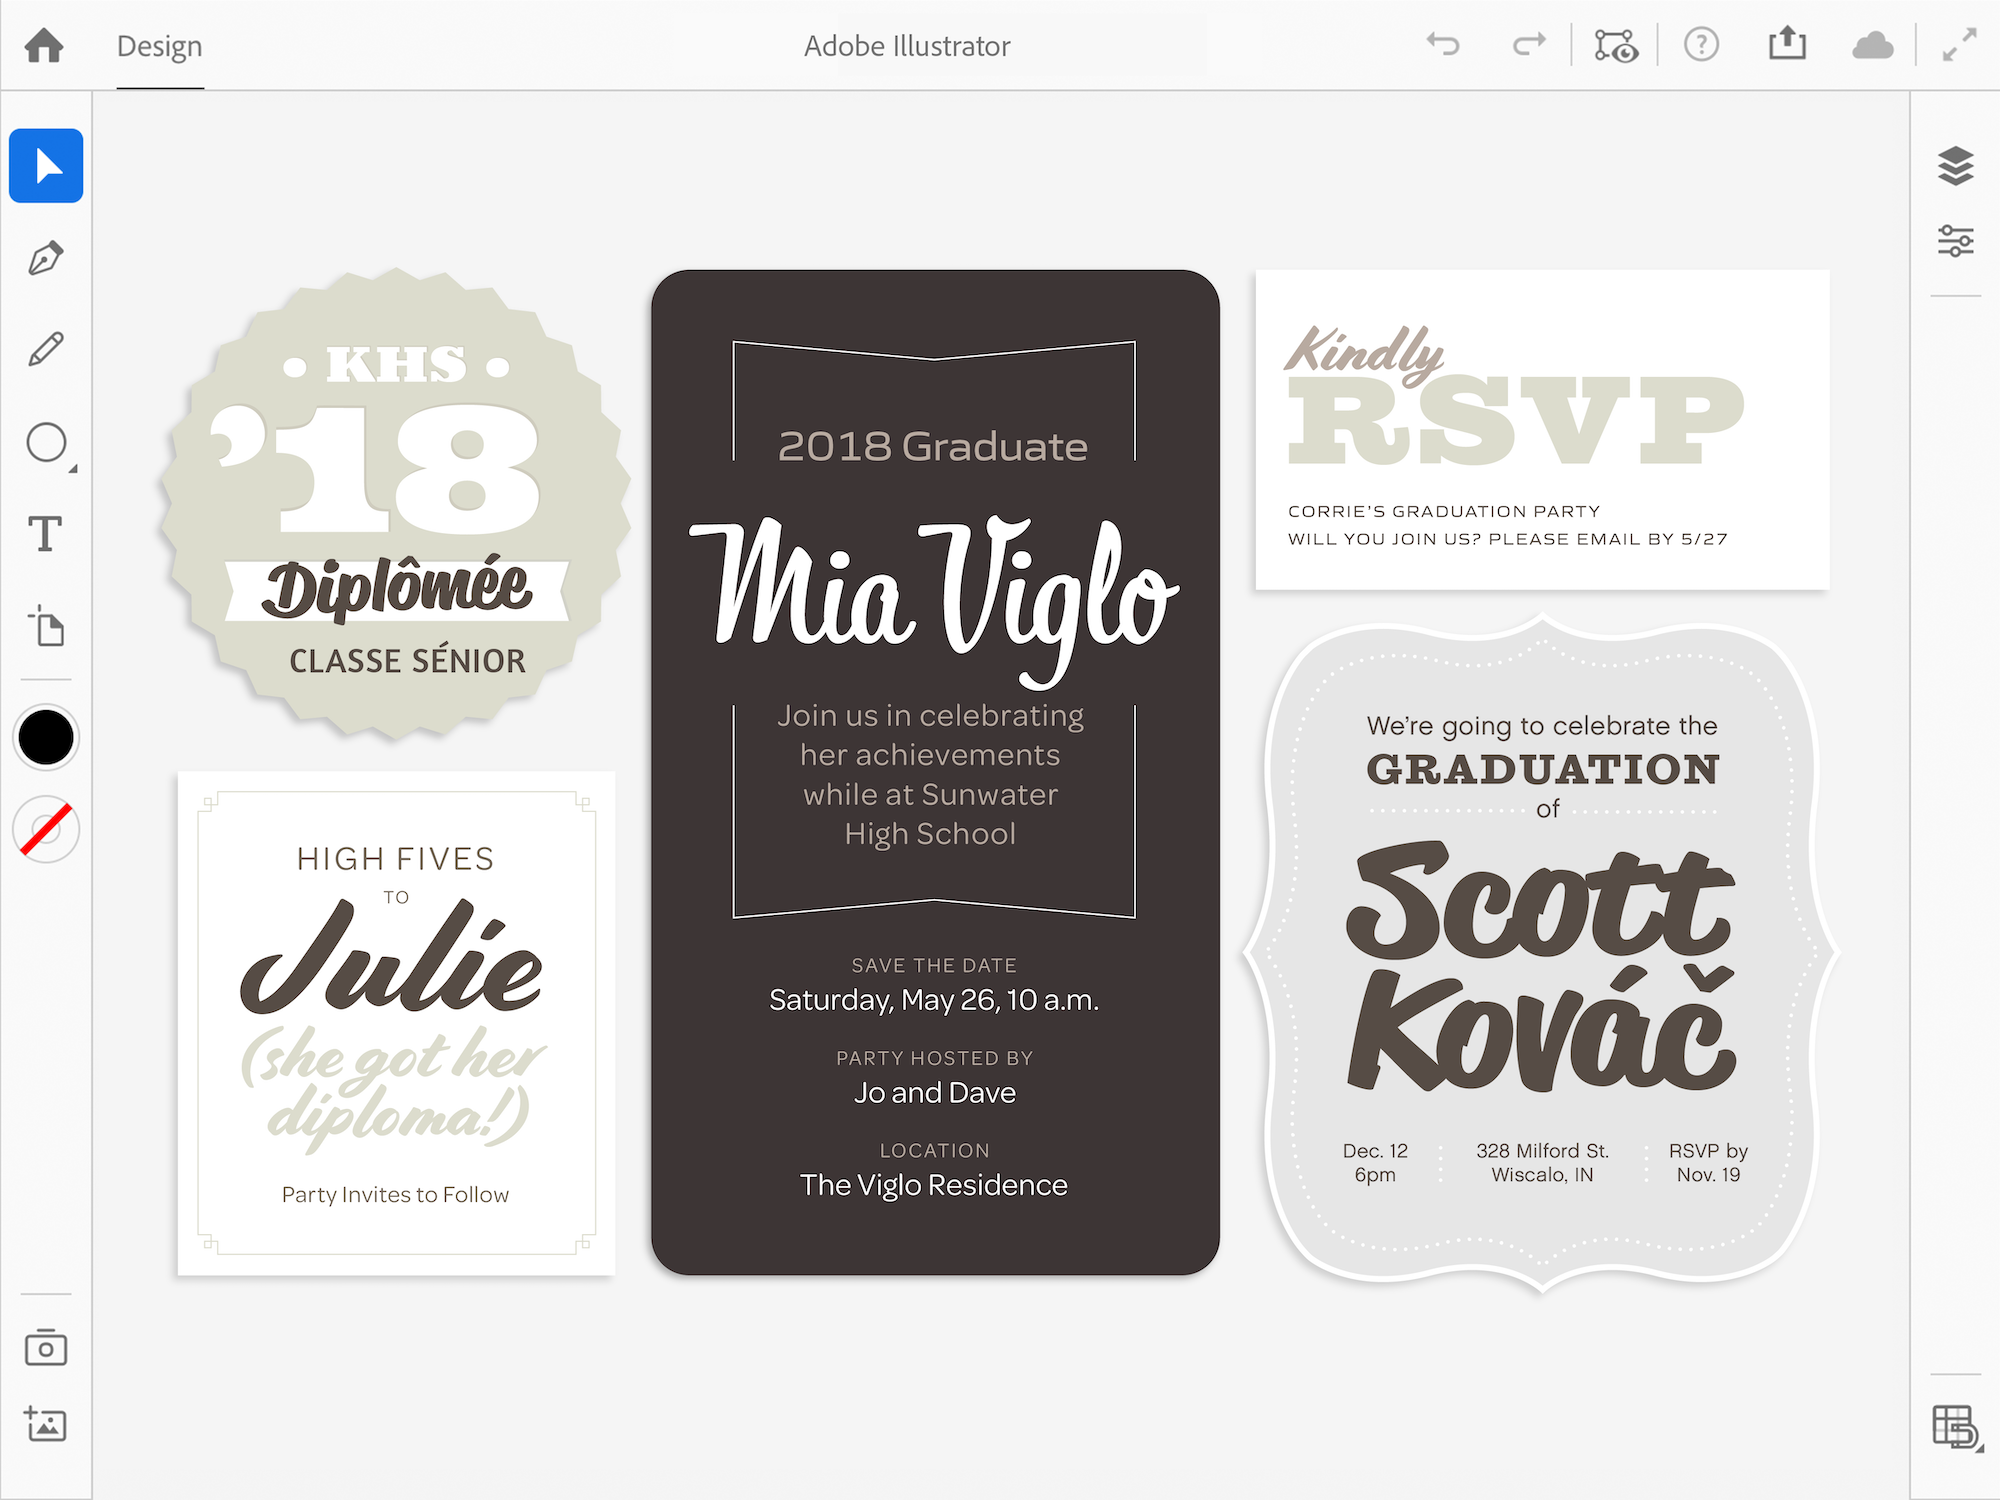 Adobe Illustrator voor iPad